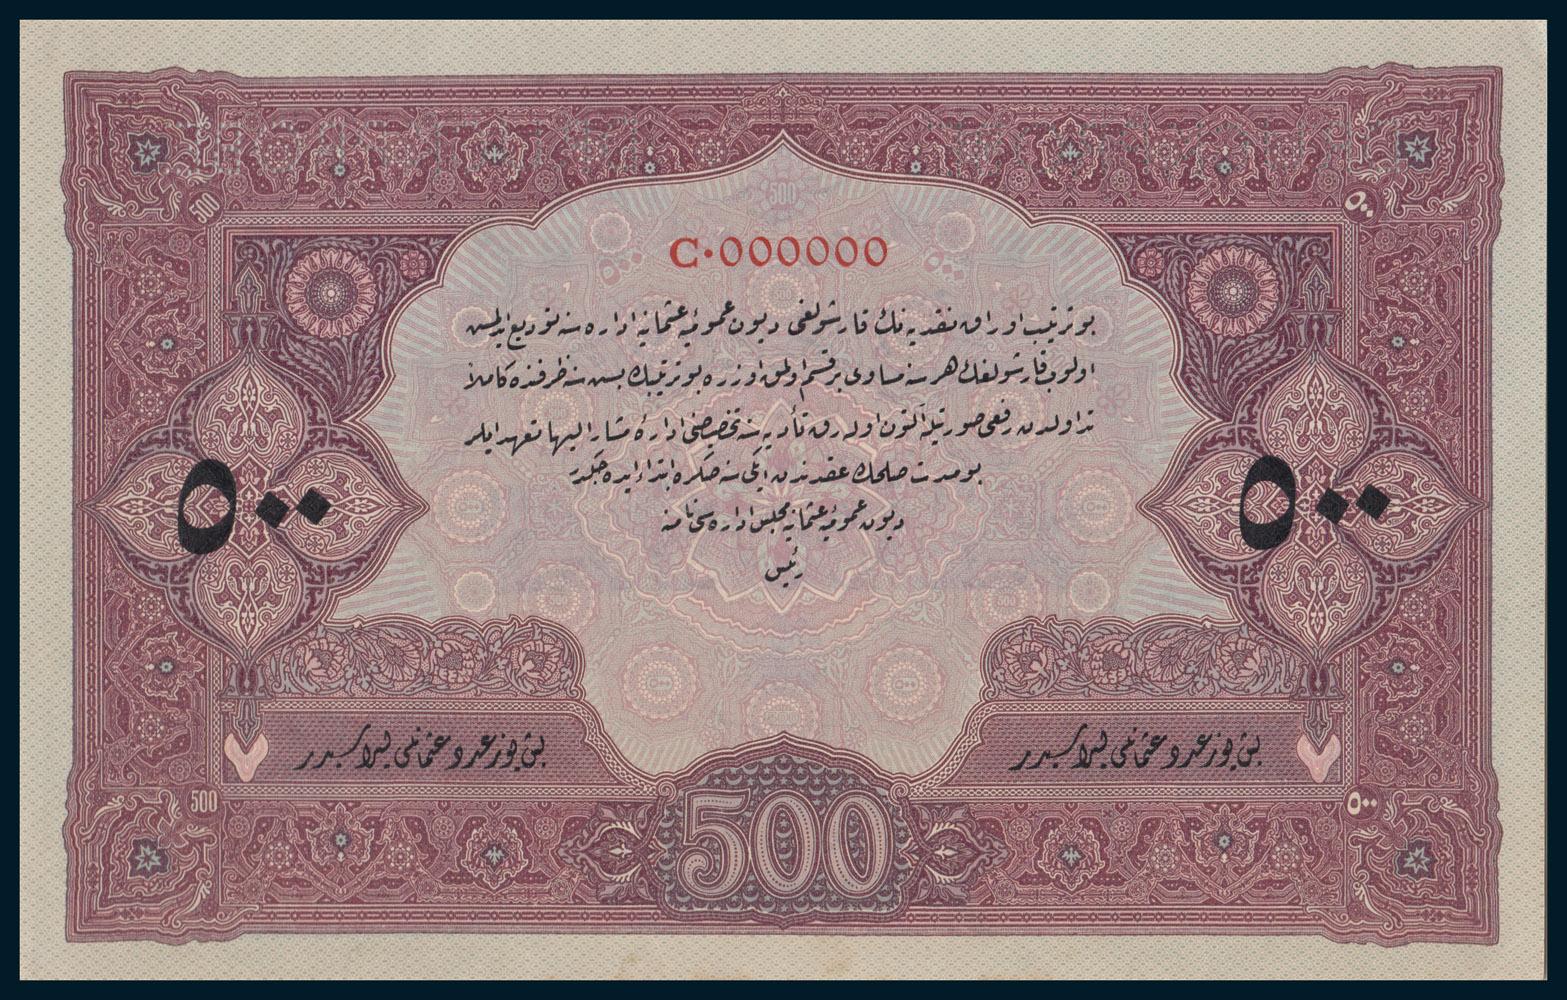 Specimen 500 Livre Banknote 1918 Turkey Ottoman Empire Collection No.115 Back